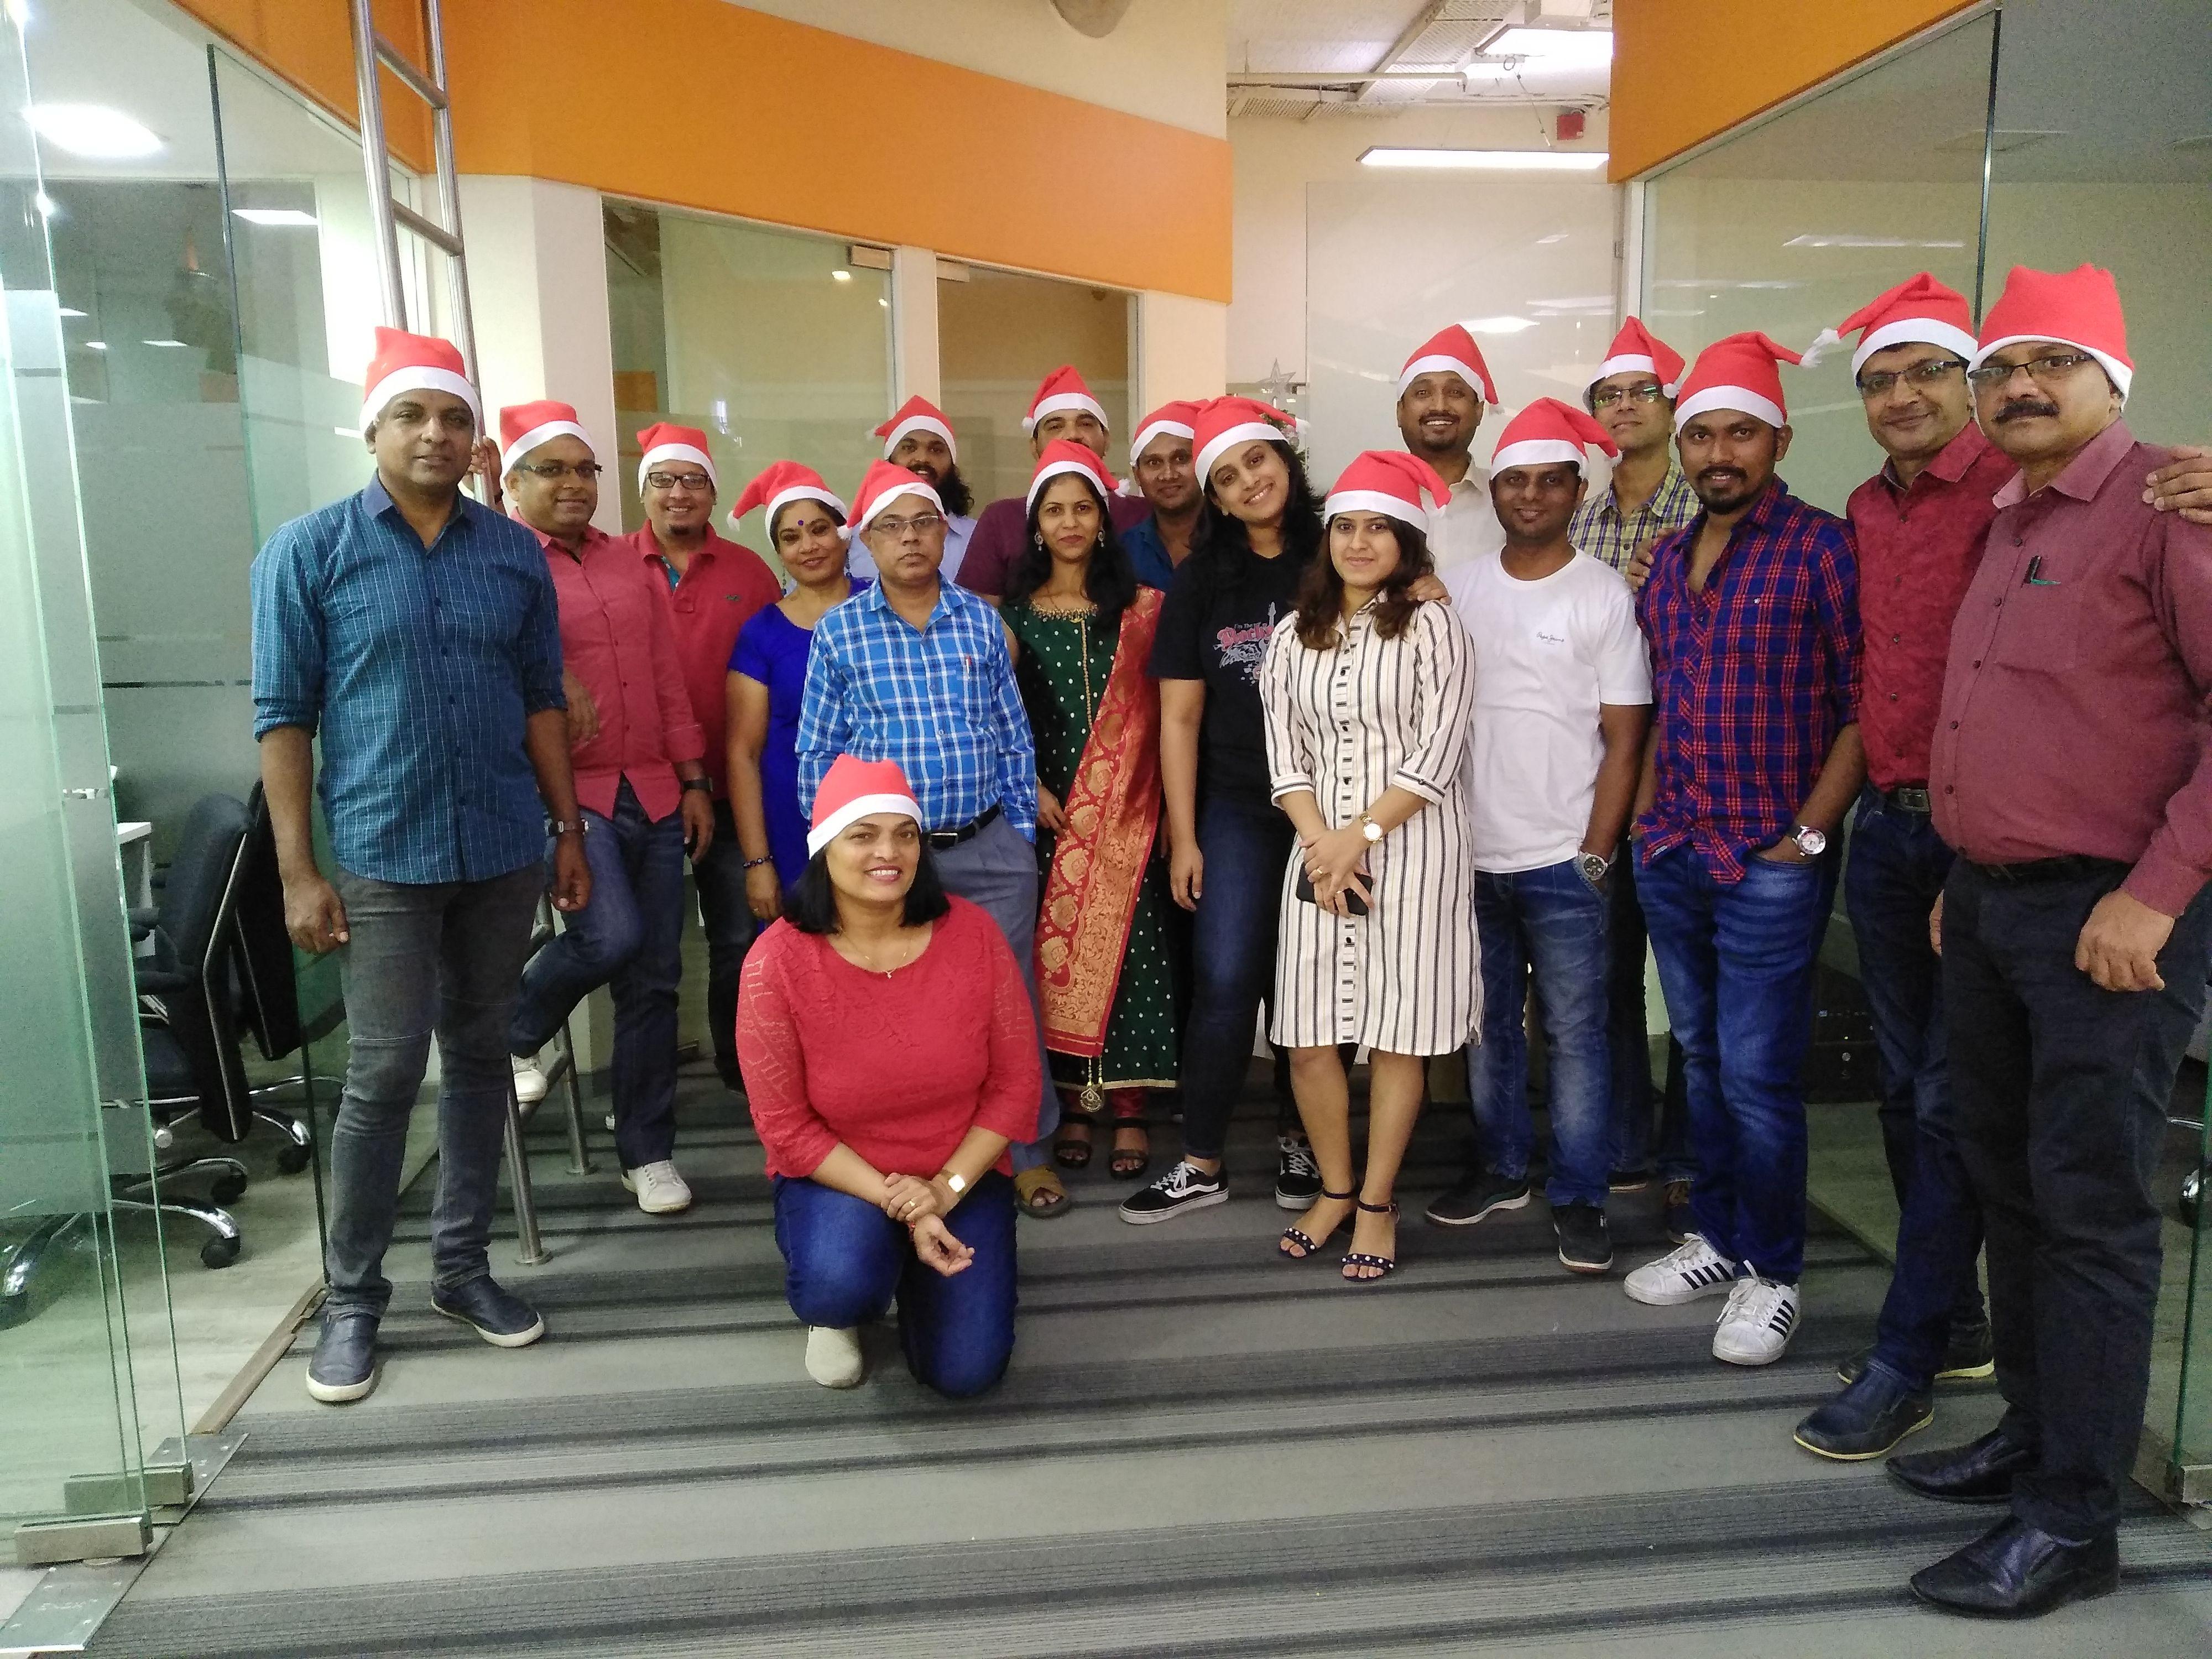 Celebrations Christmas 2020 in 2020 Brand communication